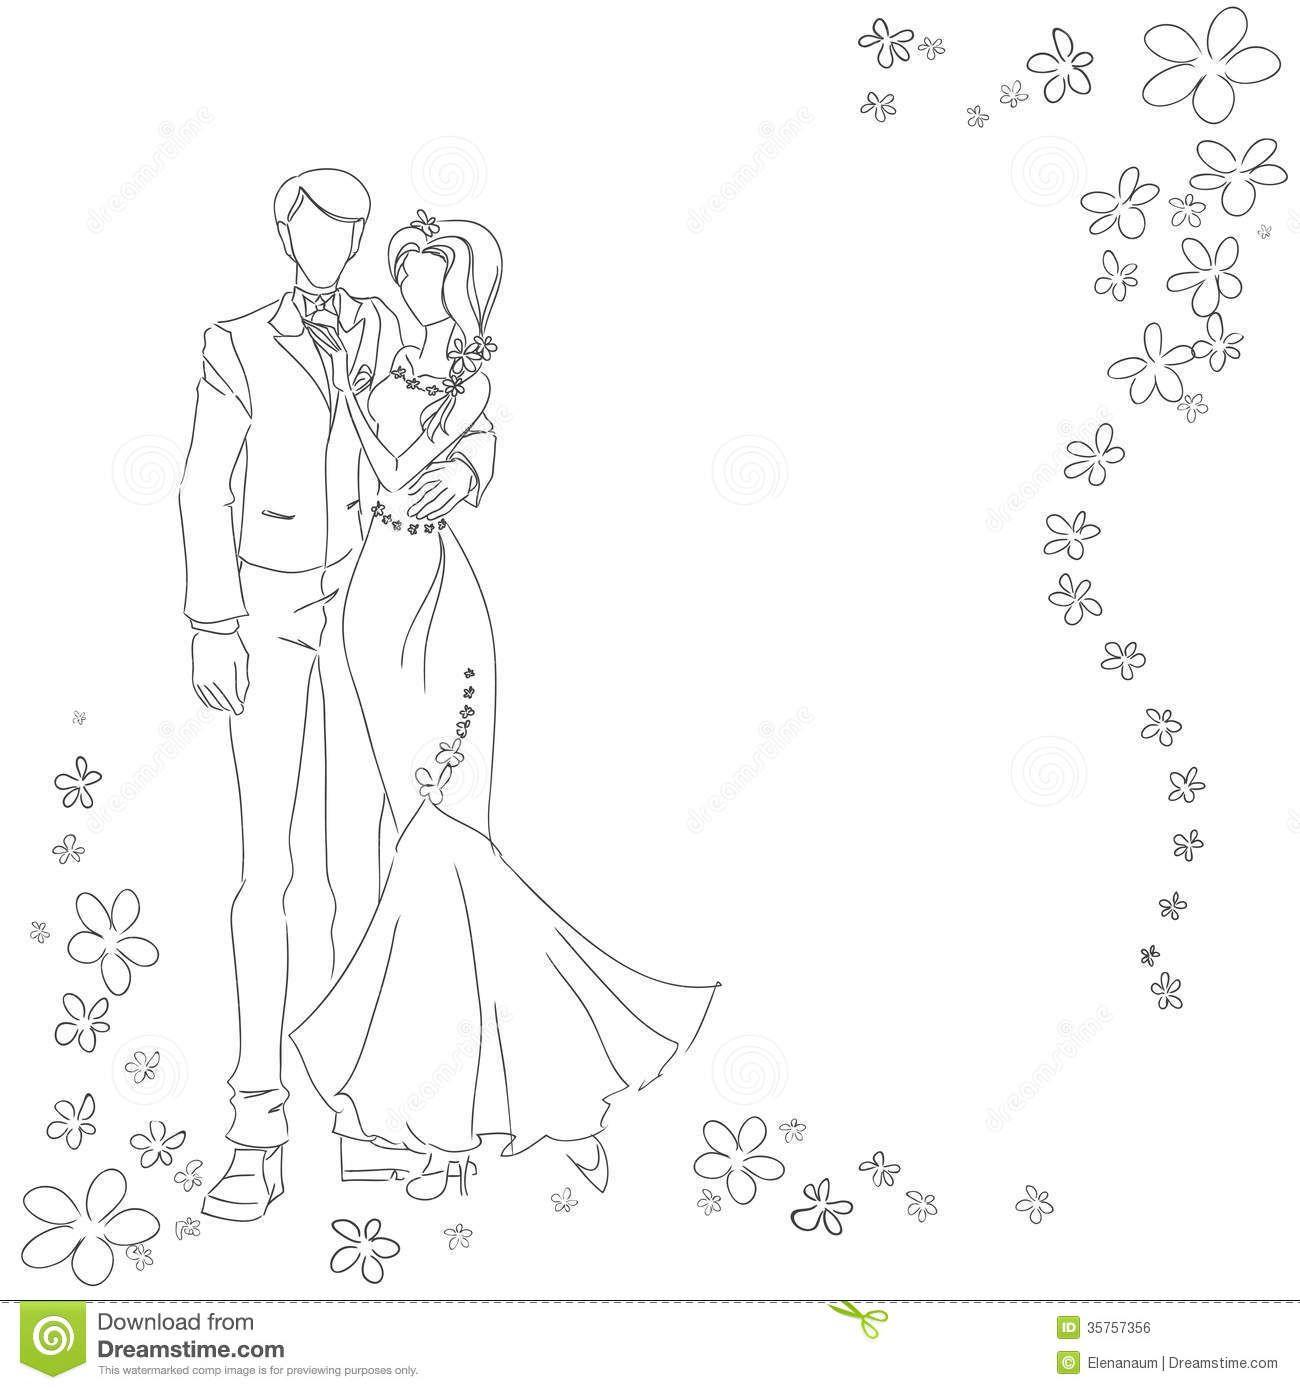 Kleurplaat Bruiloft Kleurplaten Thema Bruiloften Bruiloft